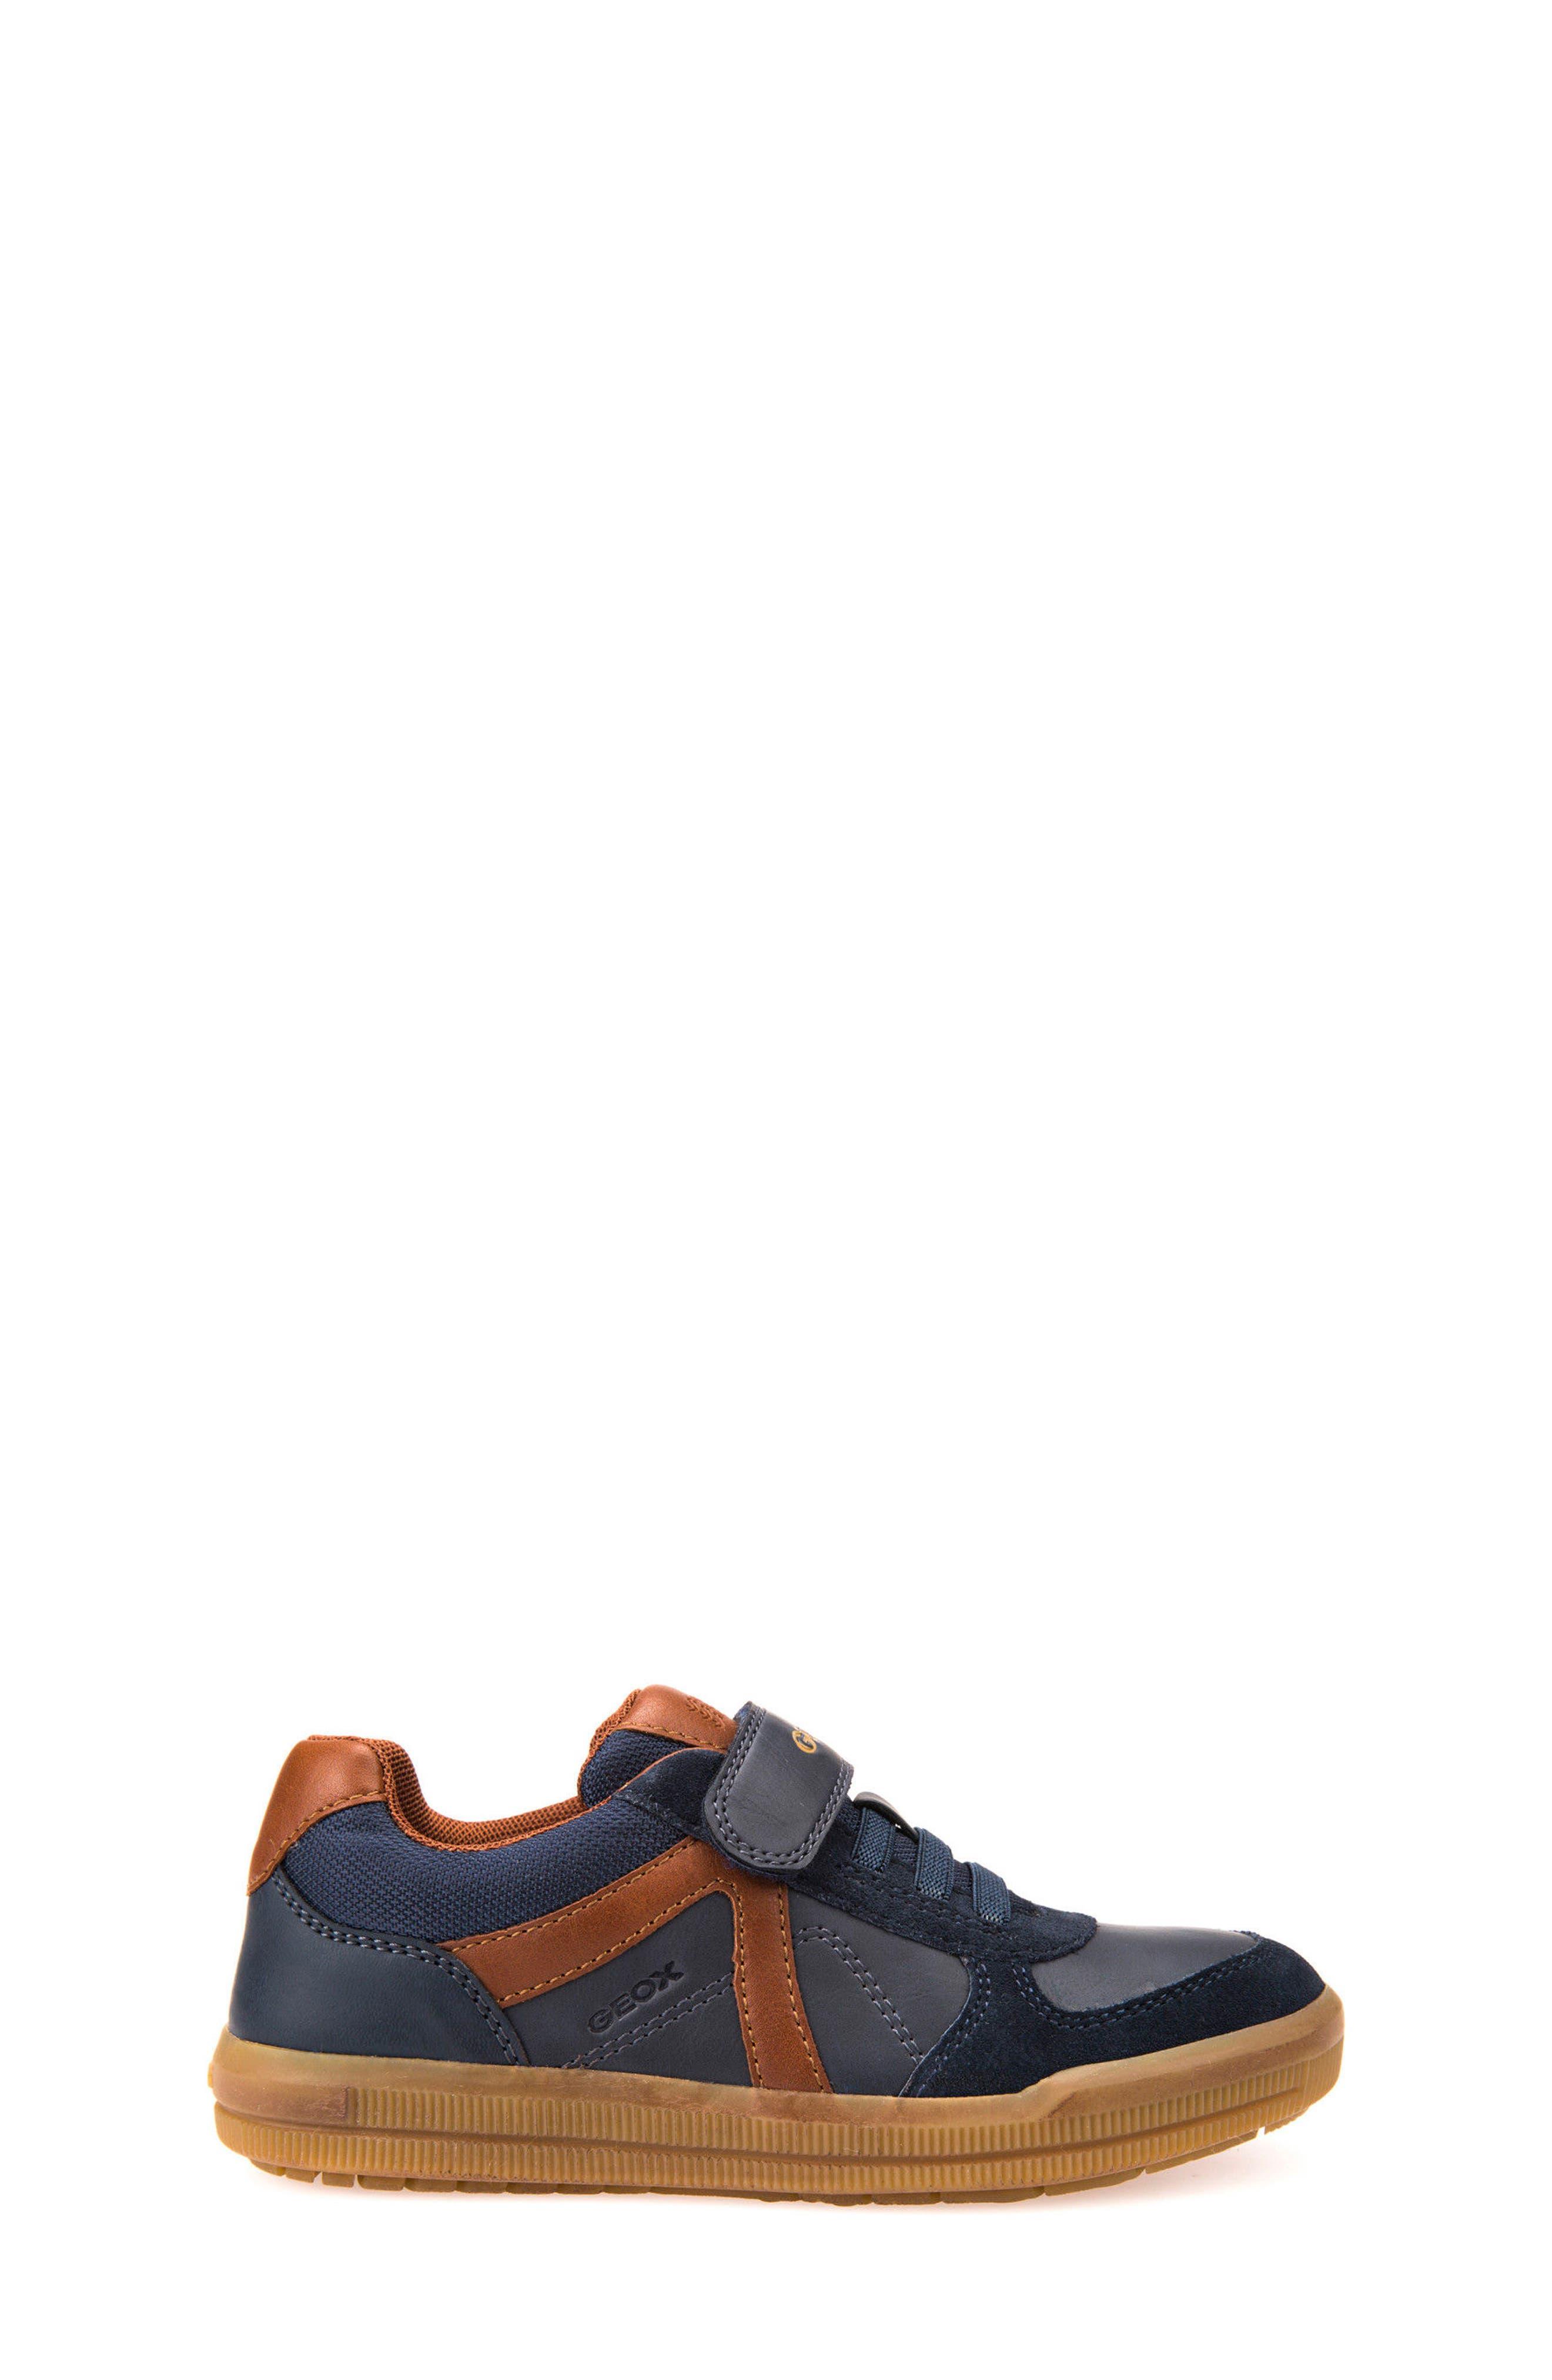 Alternate Image 3  - Geox Arzach Low Top Sneaker (Toddler, Little Kid & Big Kid)